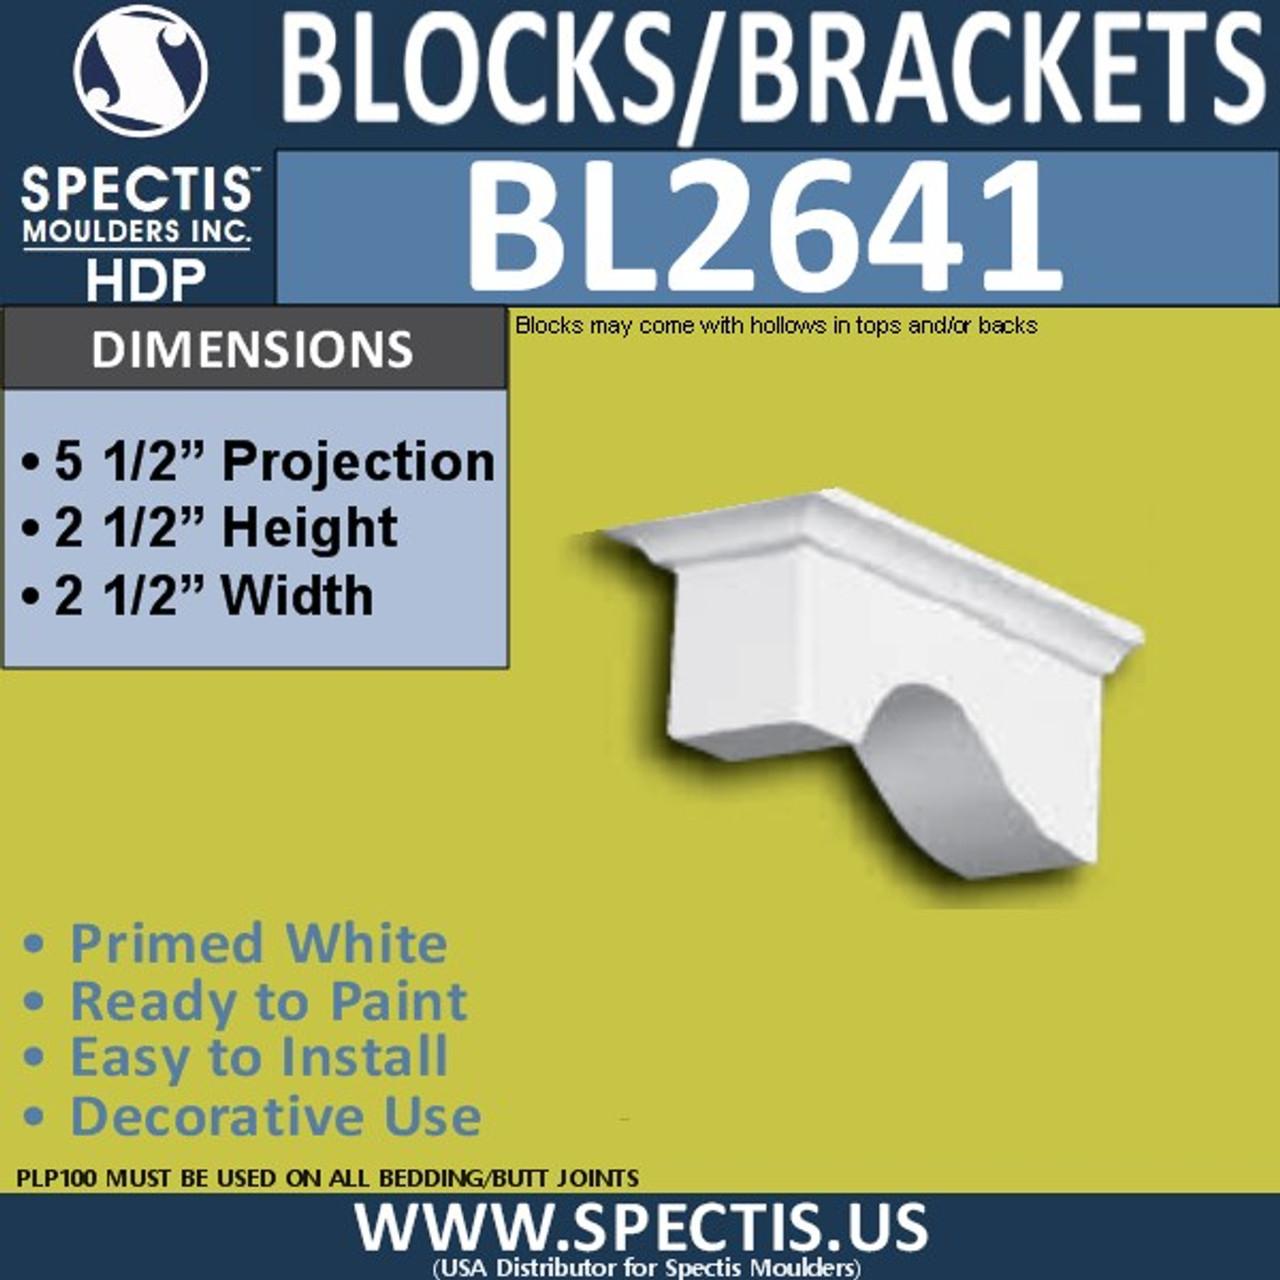 "BL2641 Eave Block or Bracket 2.5""W x 2.5""H x 5.5"" P"